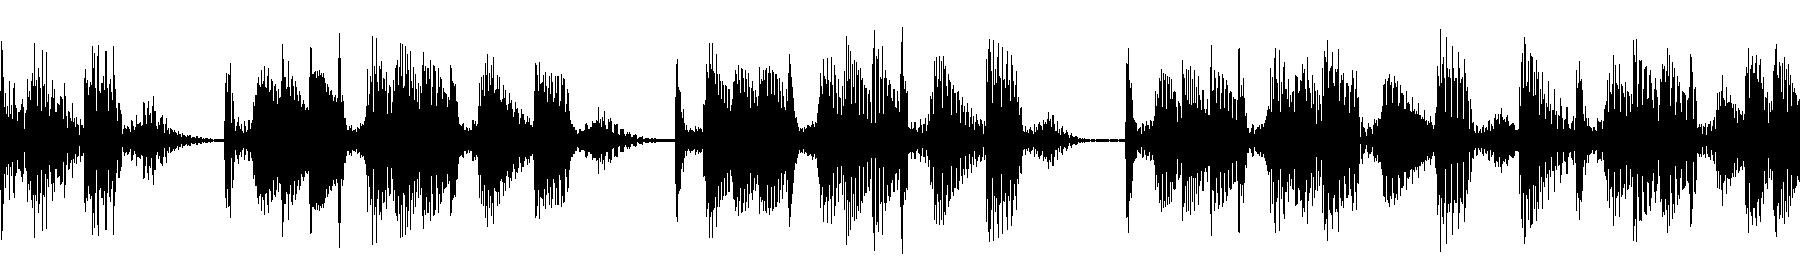 dissonant bass